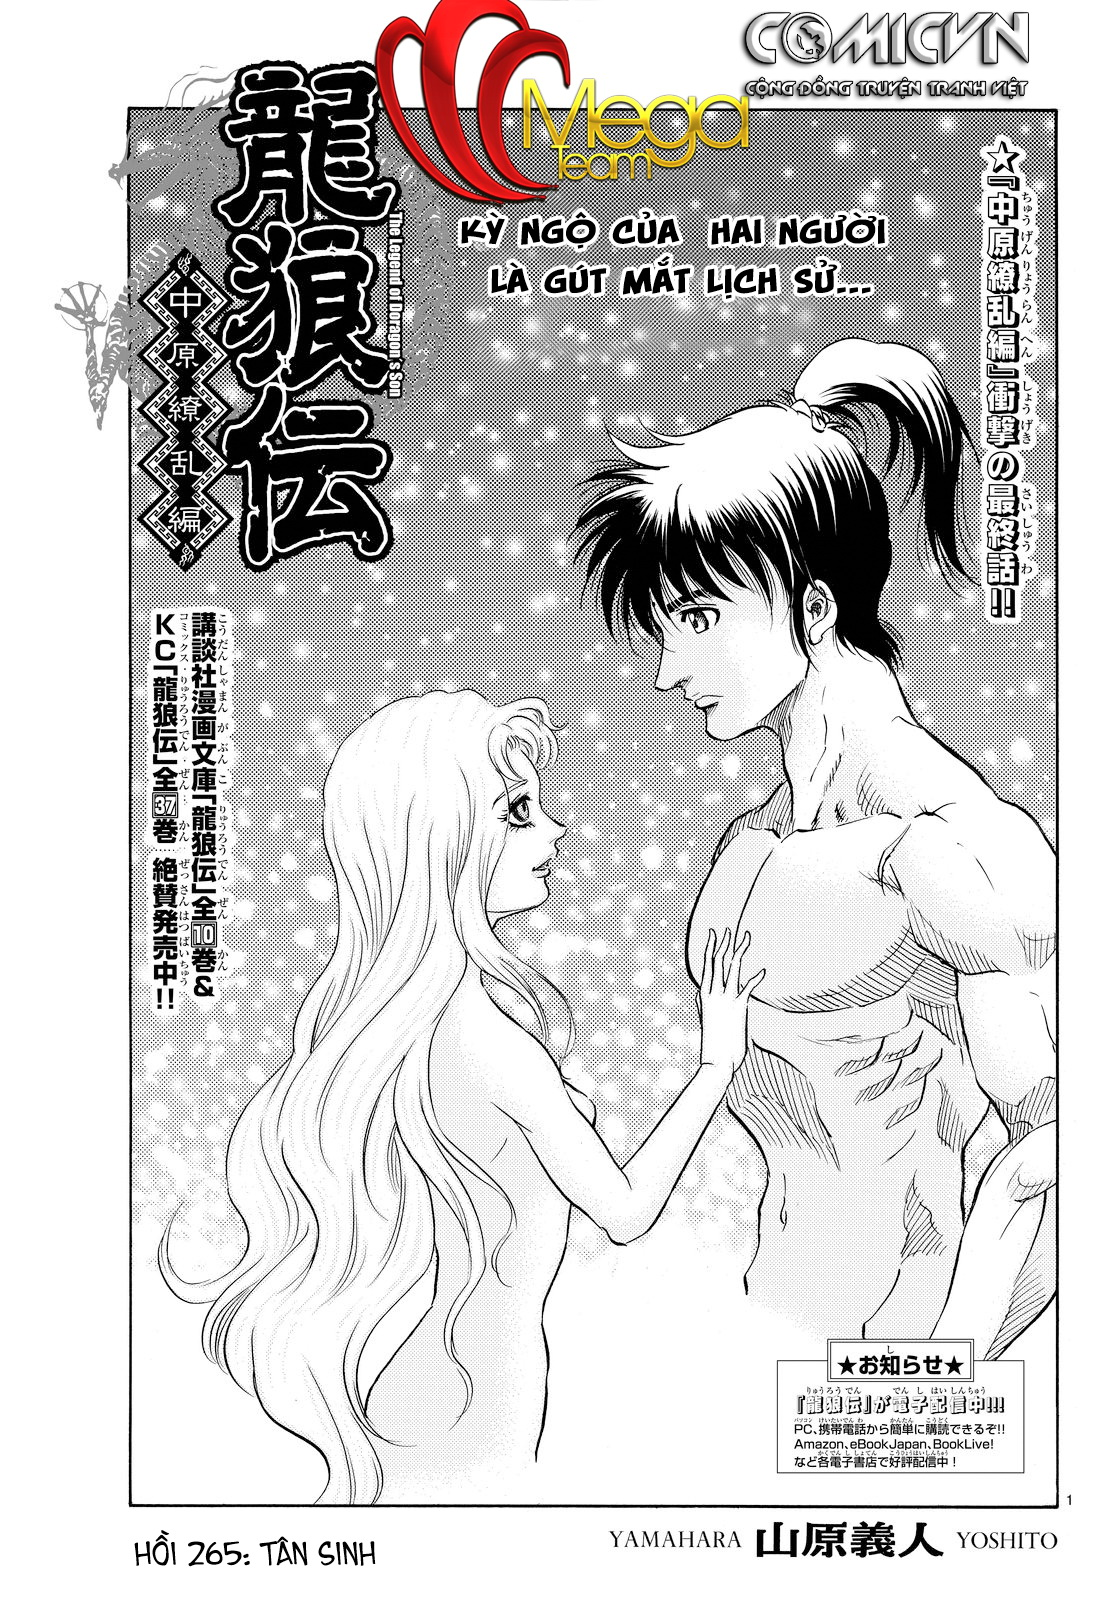 Ryuuroden chu be rong chap 265 trang 0 manga24h